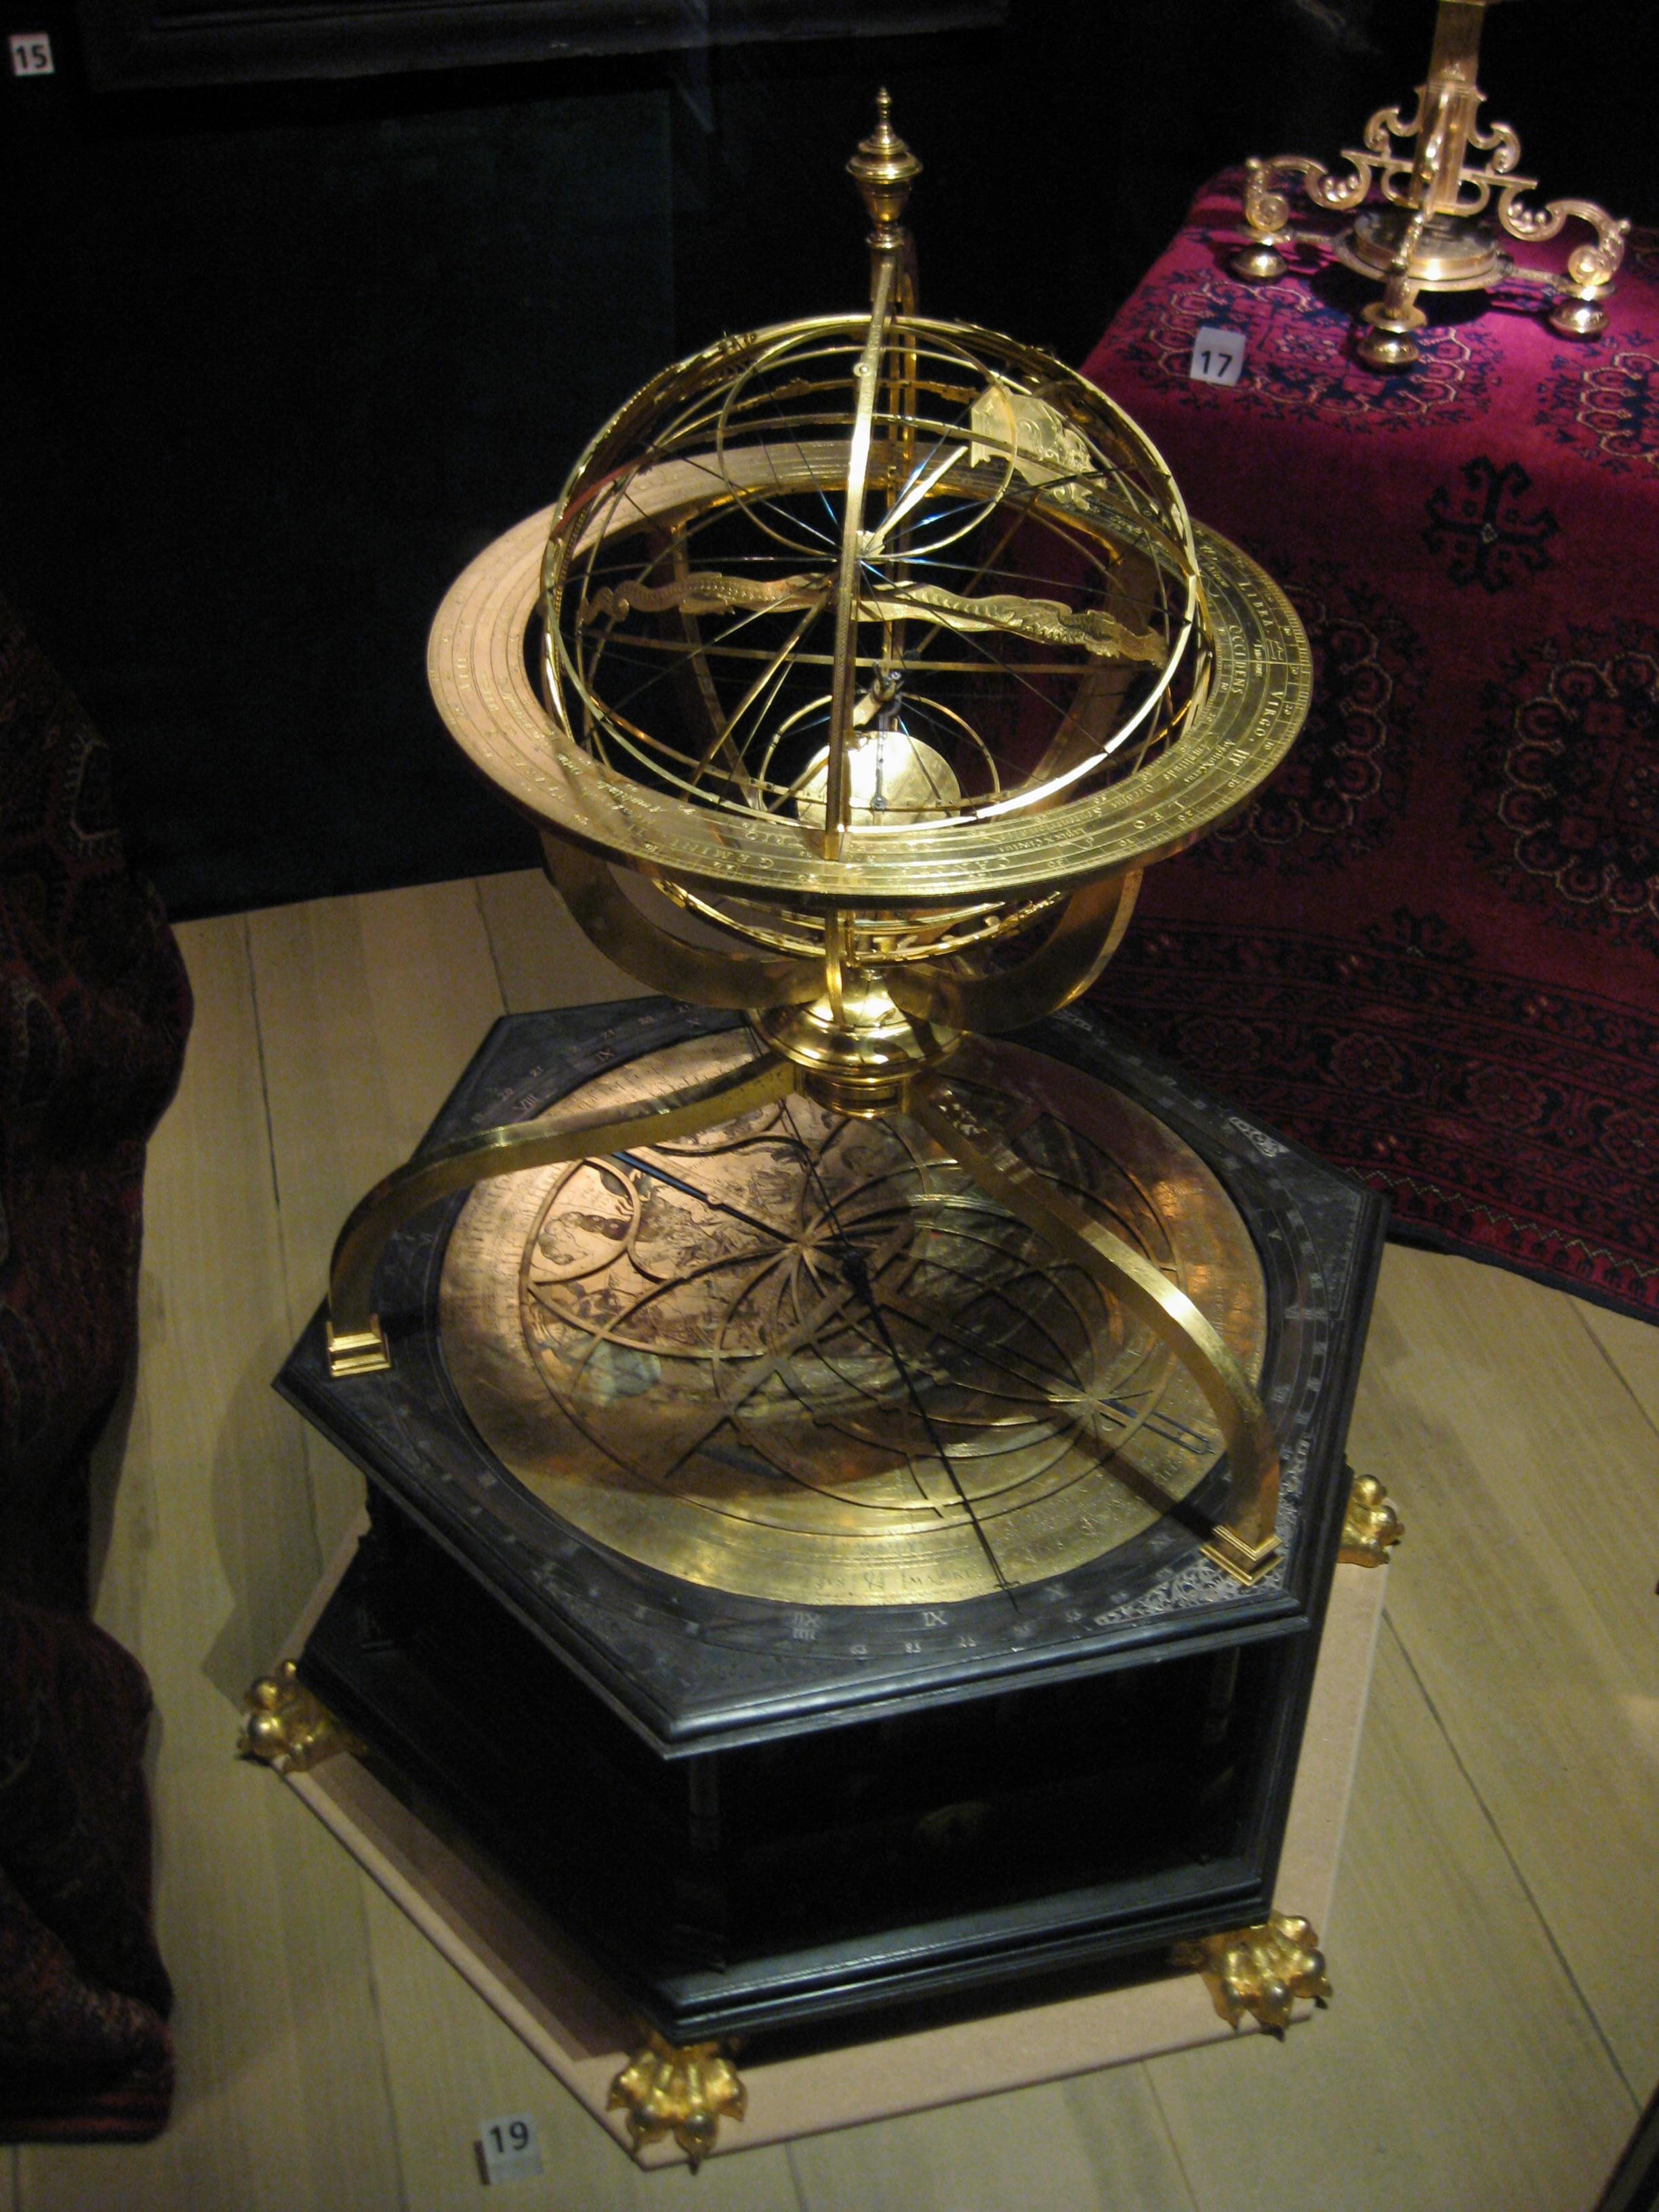 cc39182ad86 Armillary sphere - Wikipedia